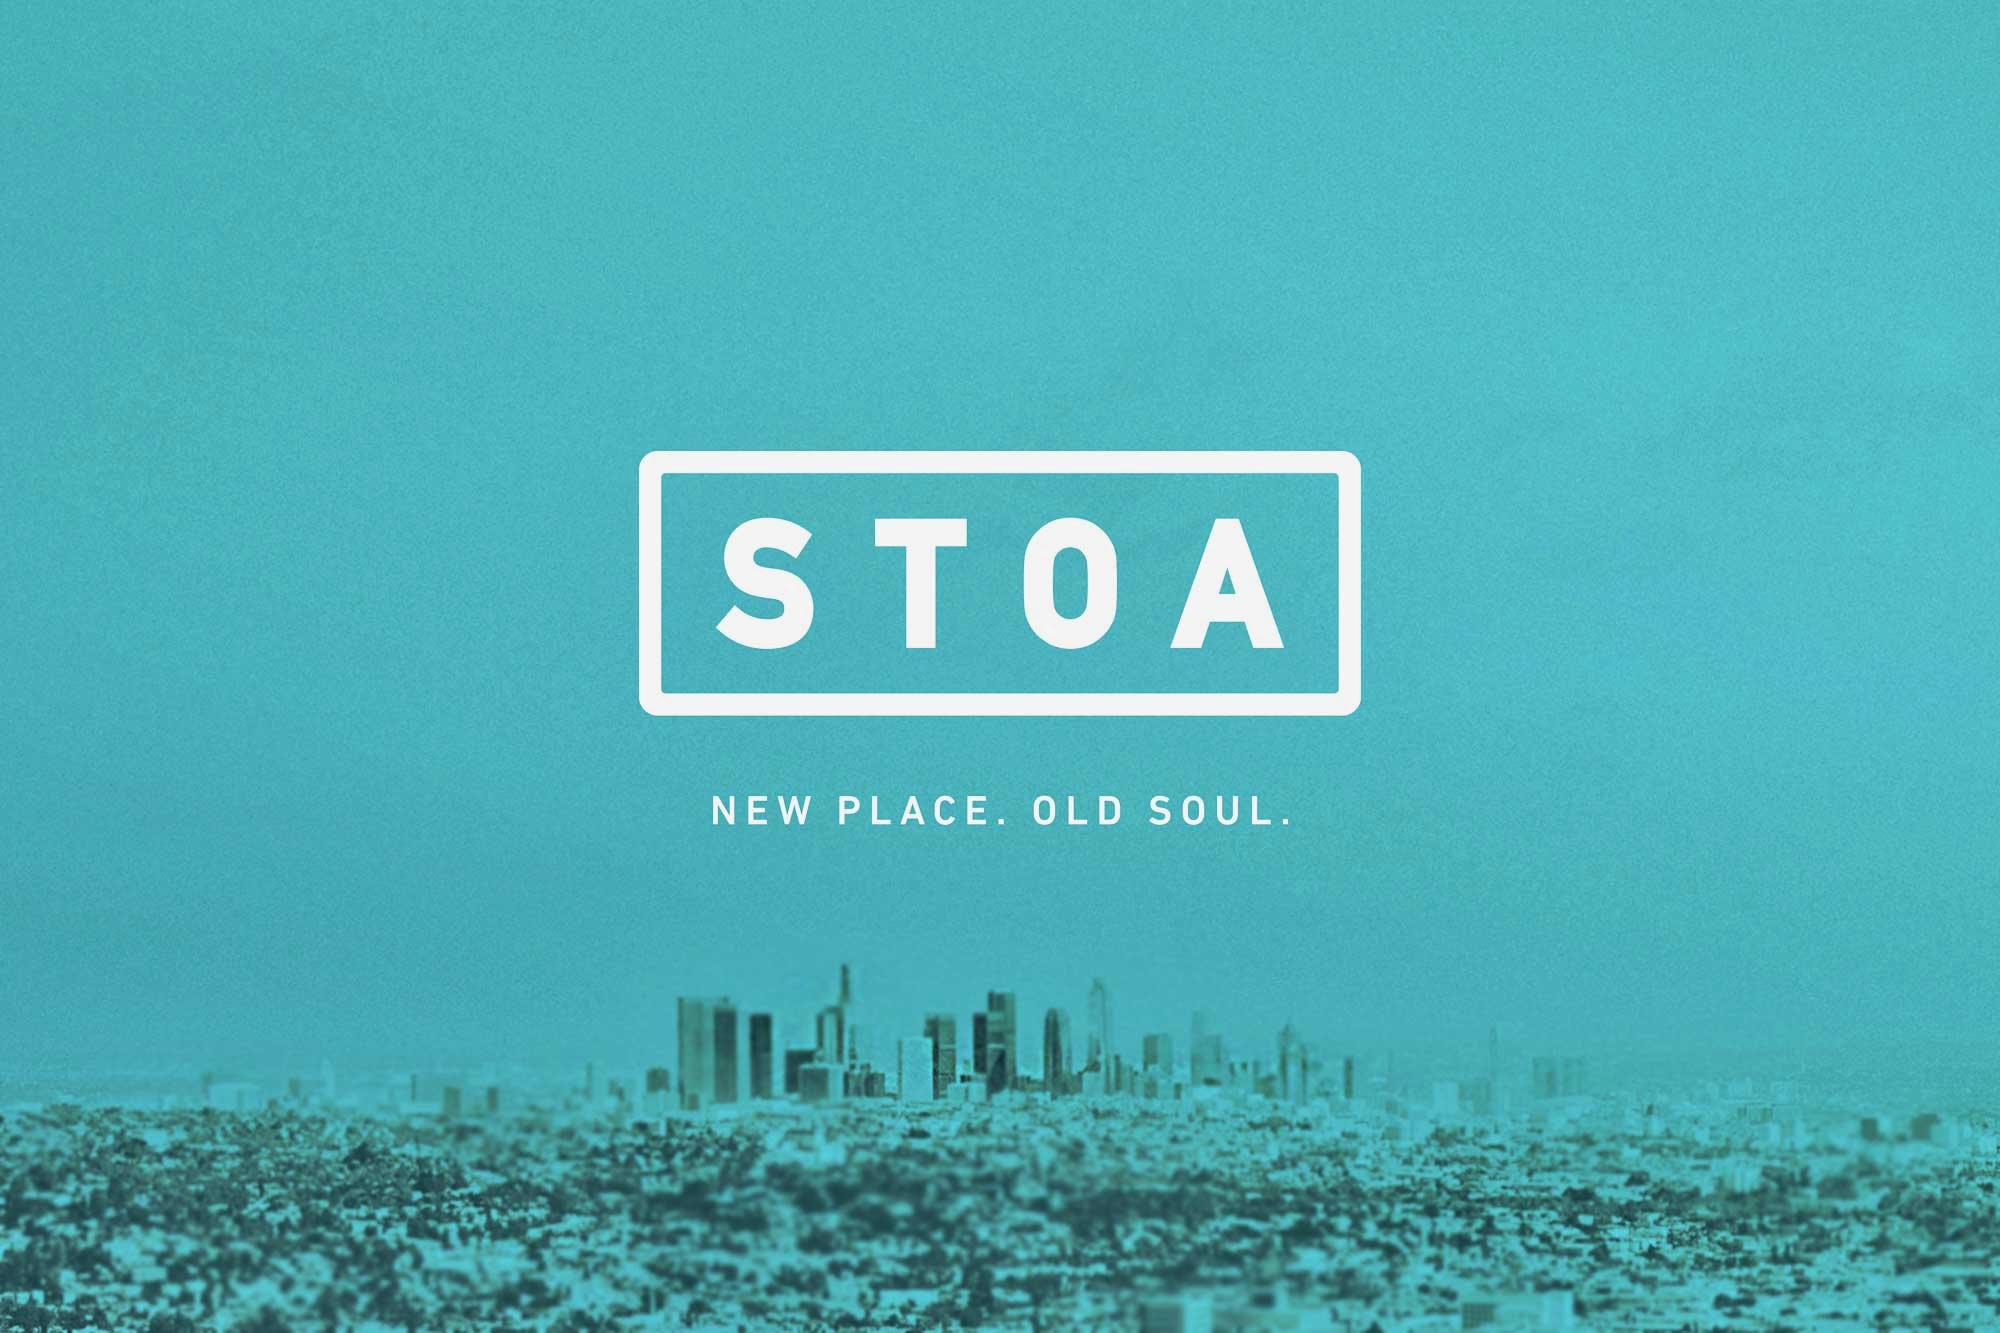 ron-miriello-grafico_STOA-los-angeles-dtla-Downtown-apartment-branding22.jpg